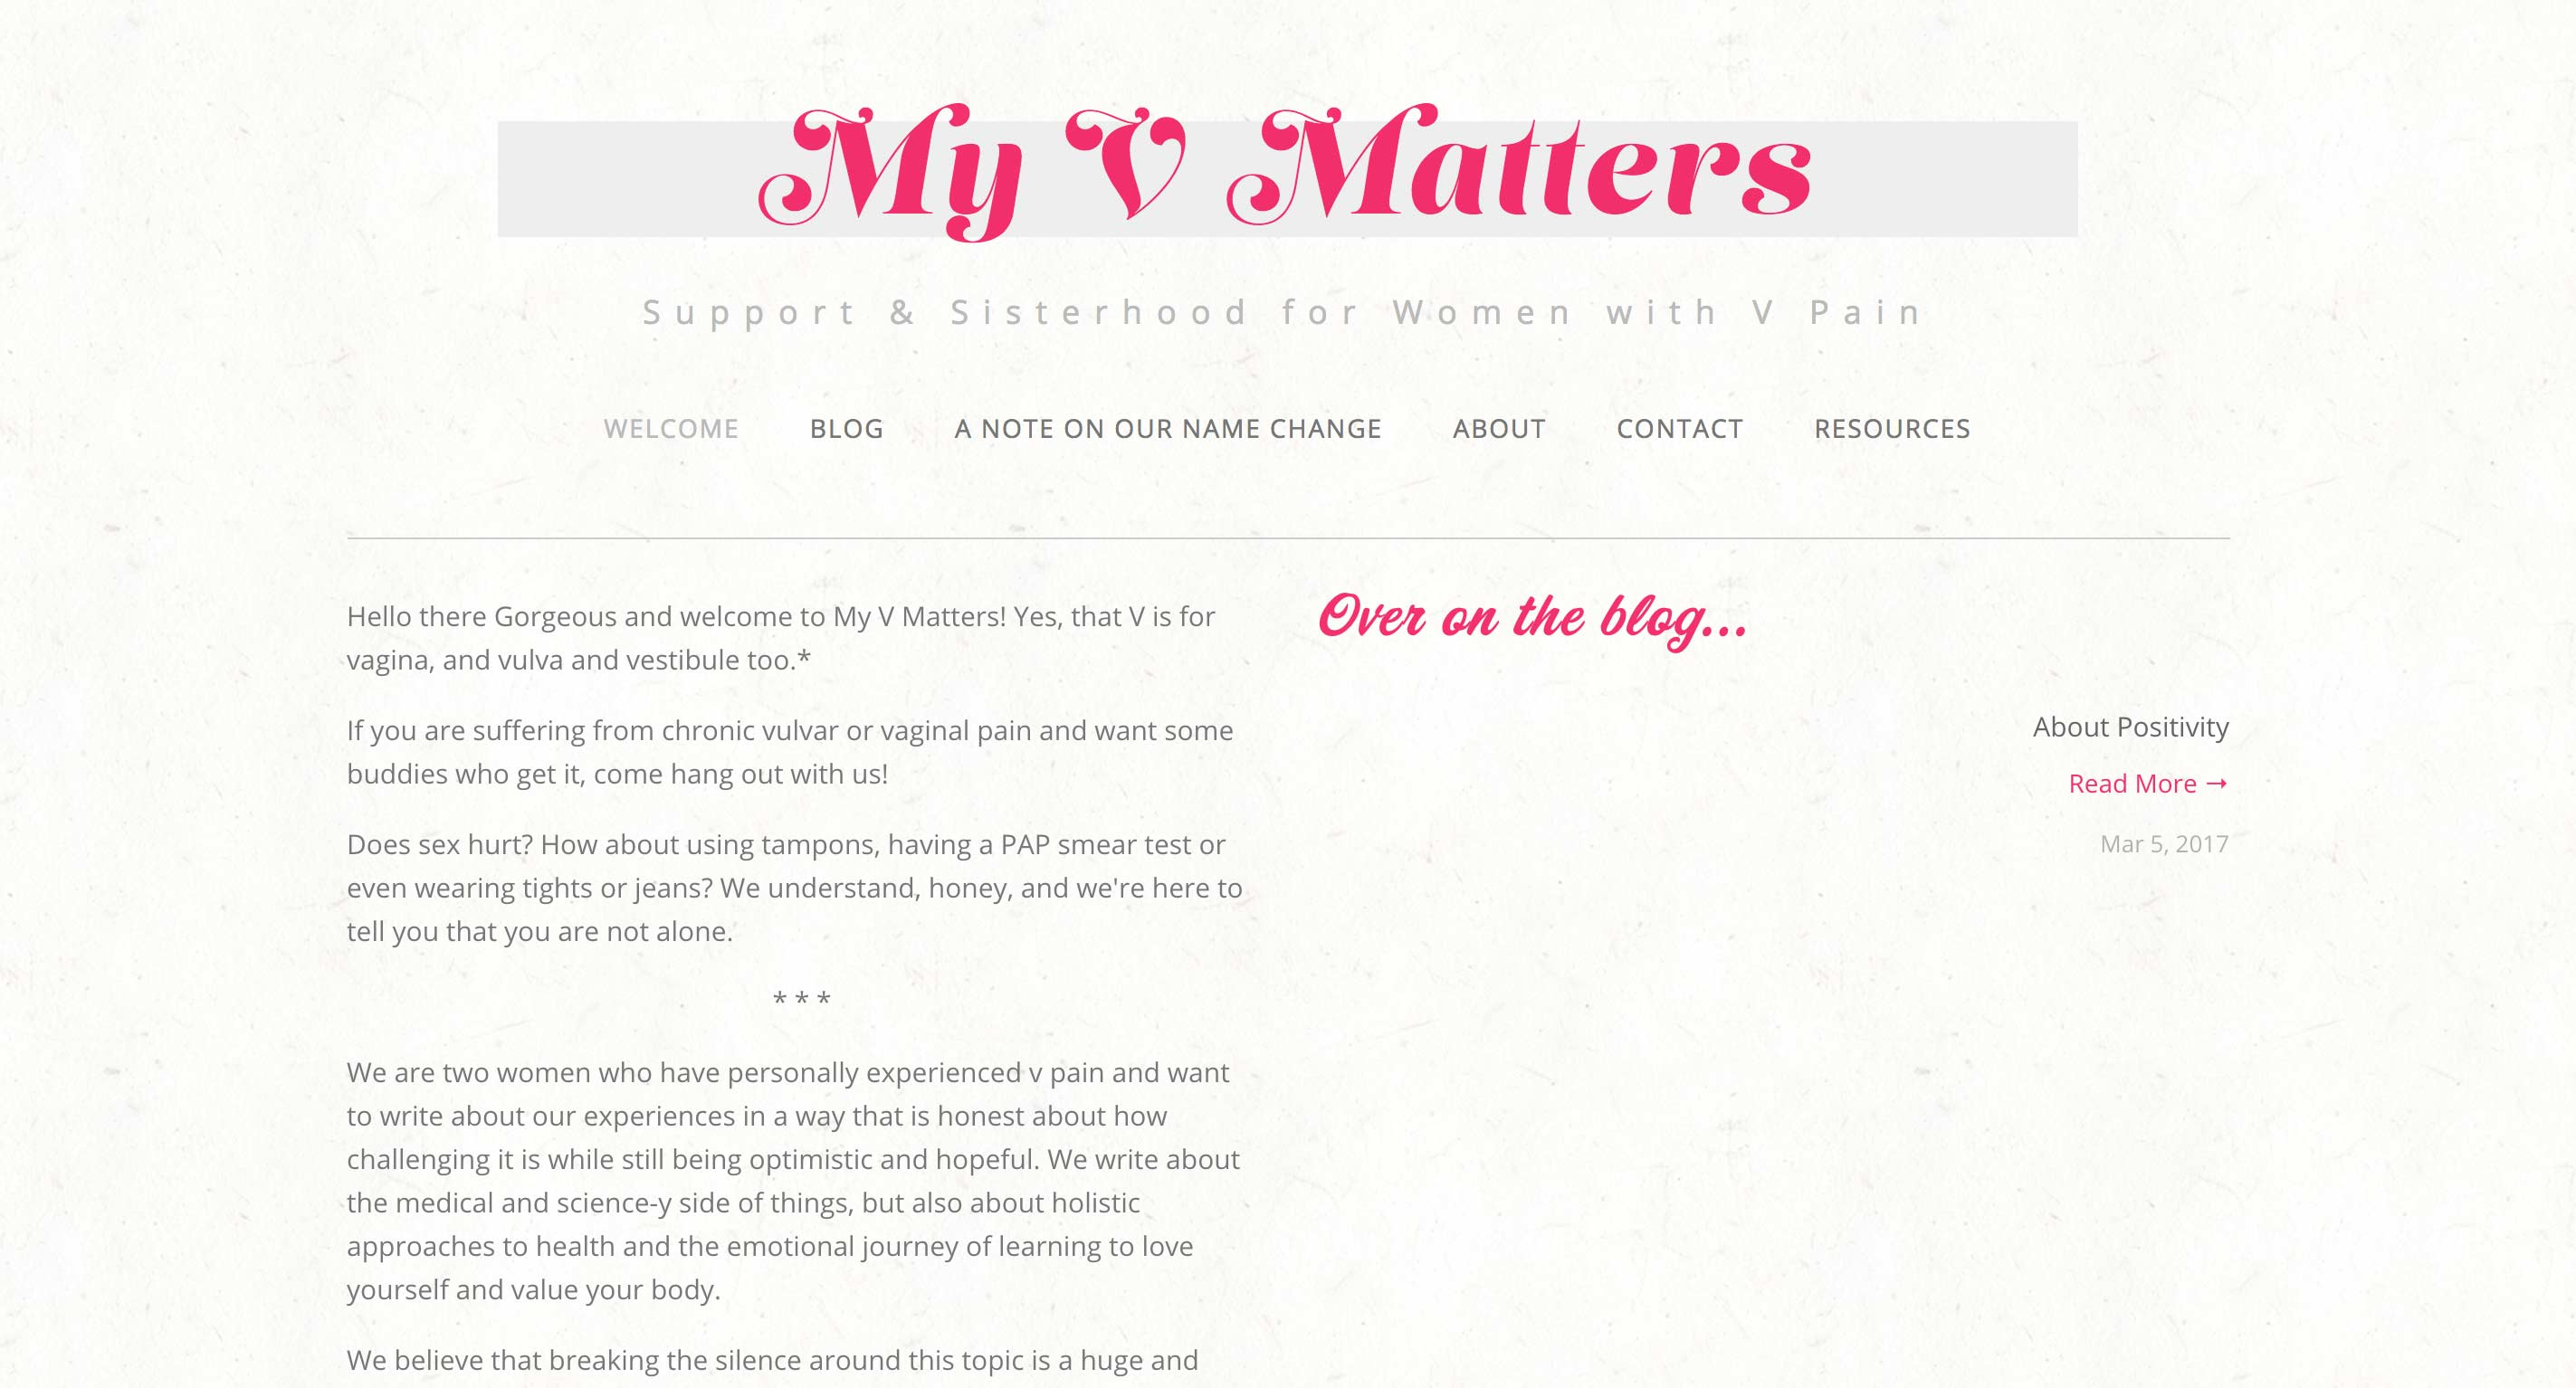 My V Matters